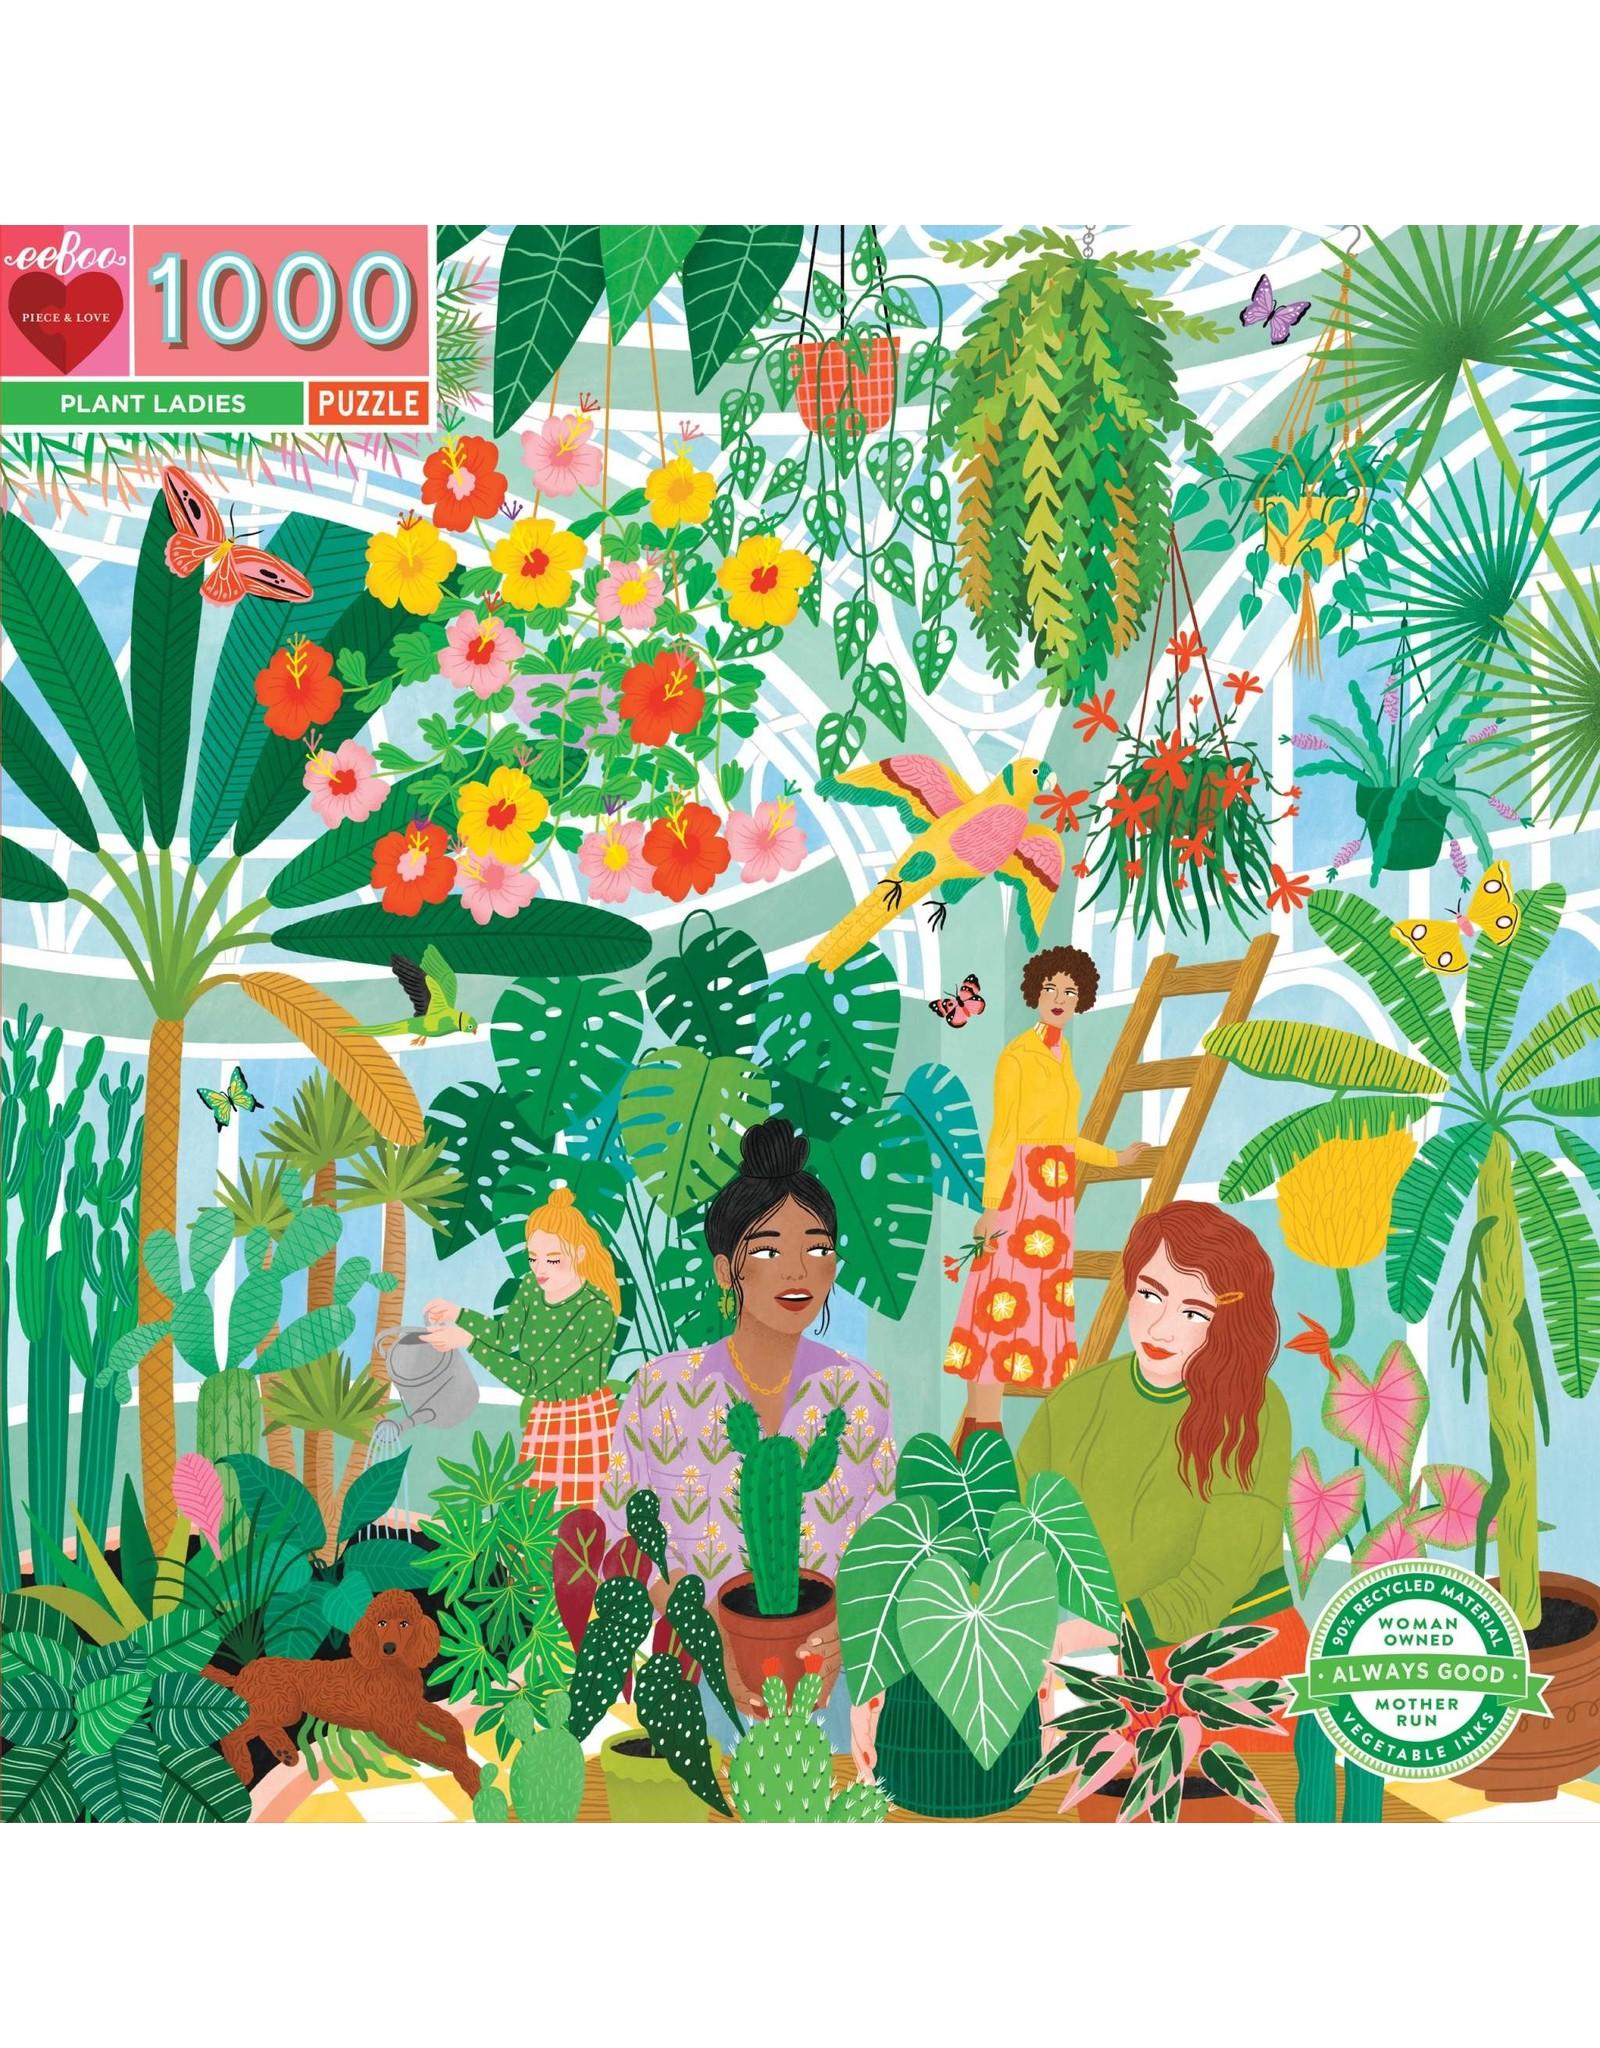 eeBoo Plant Ladies 1000p